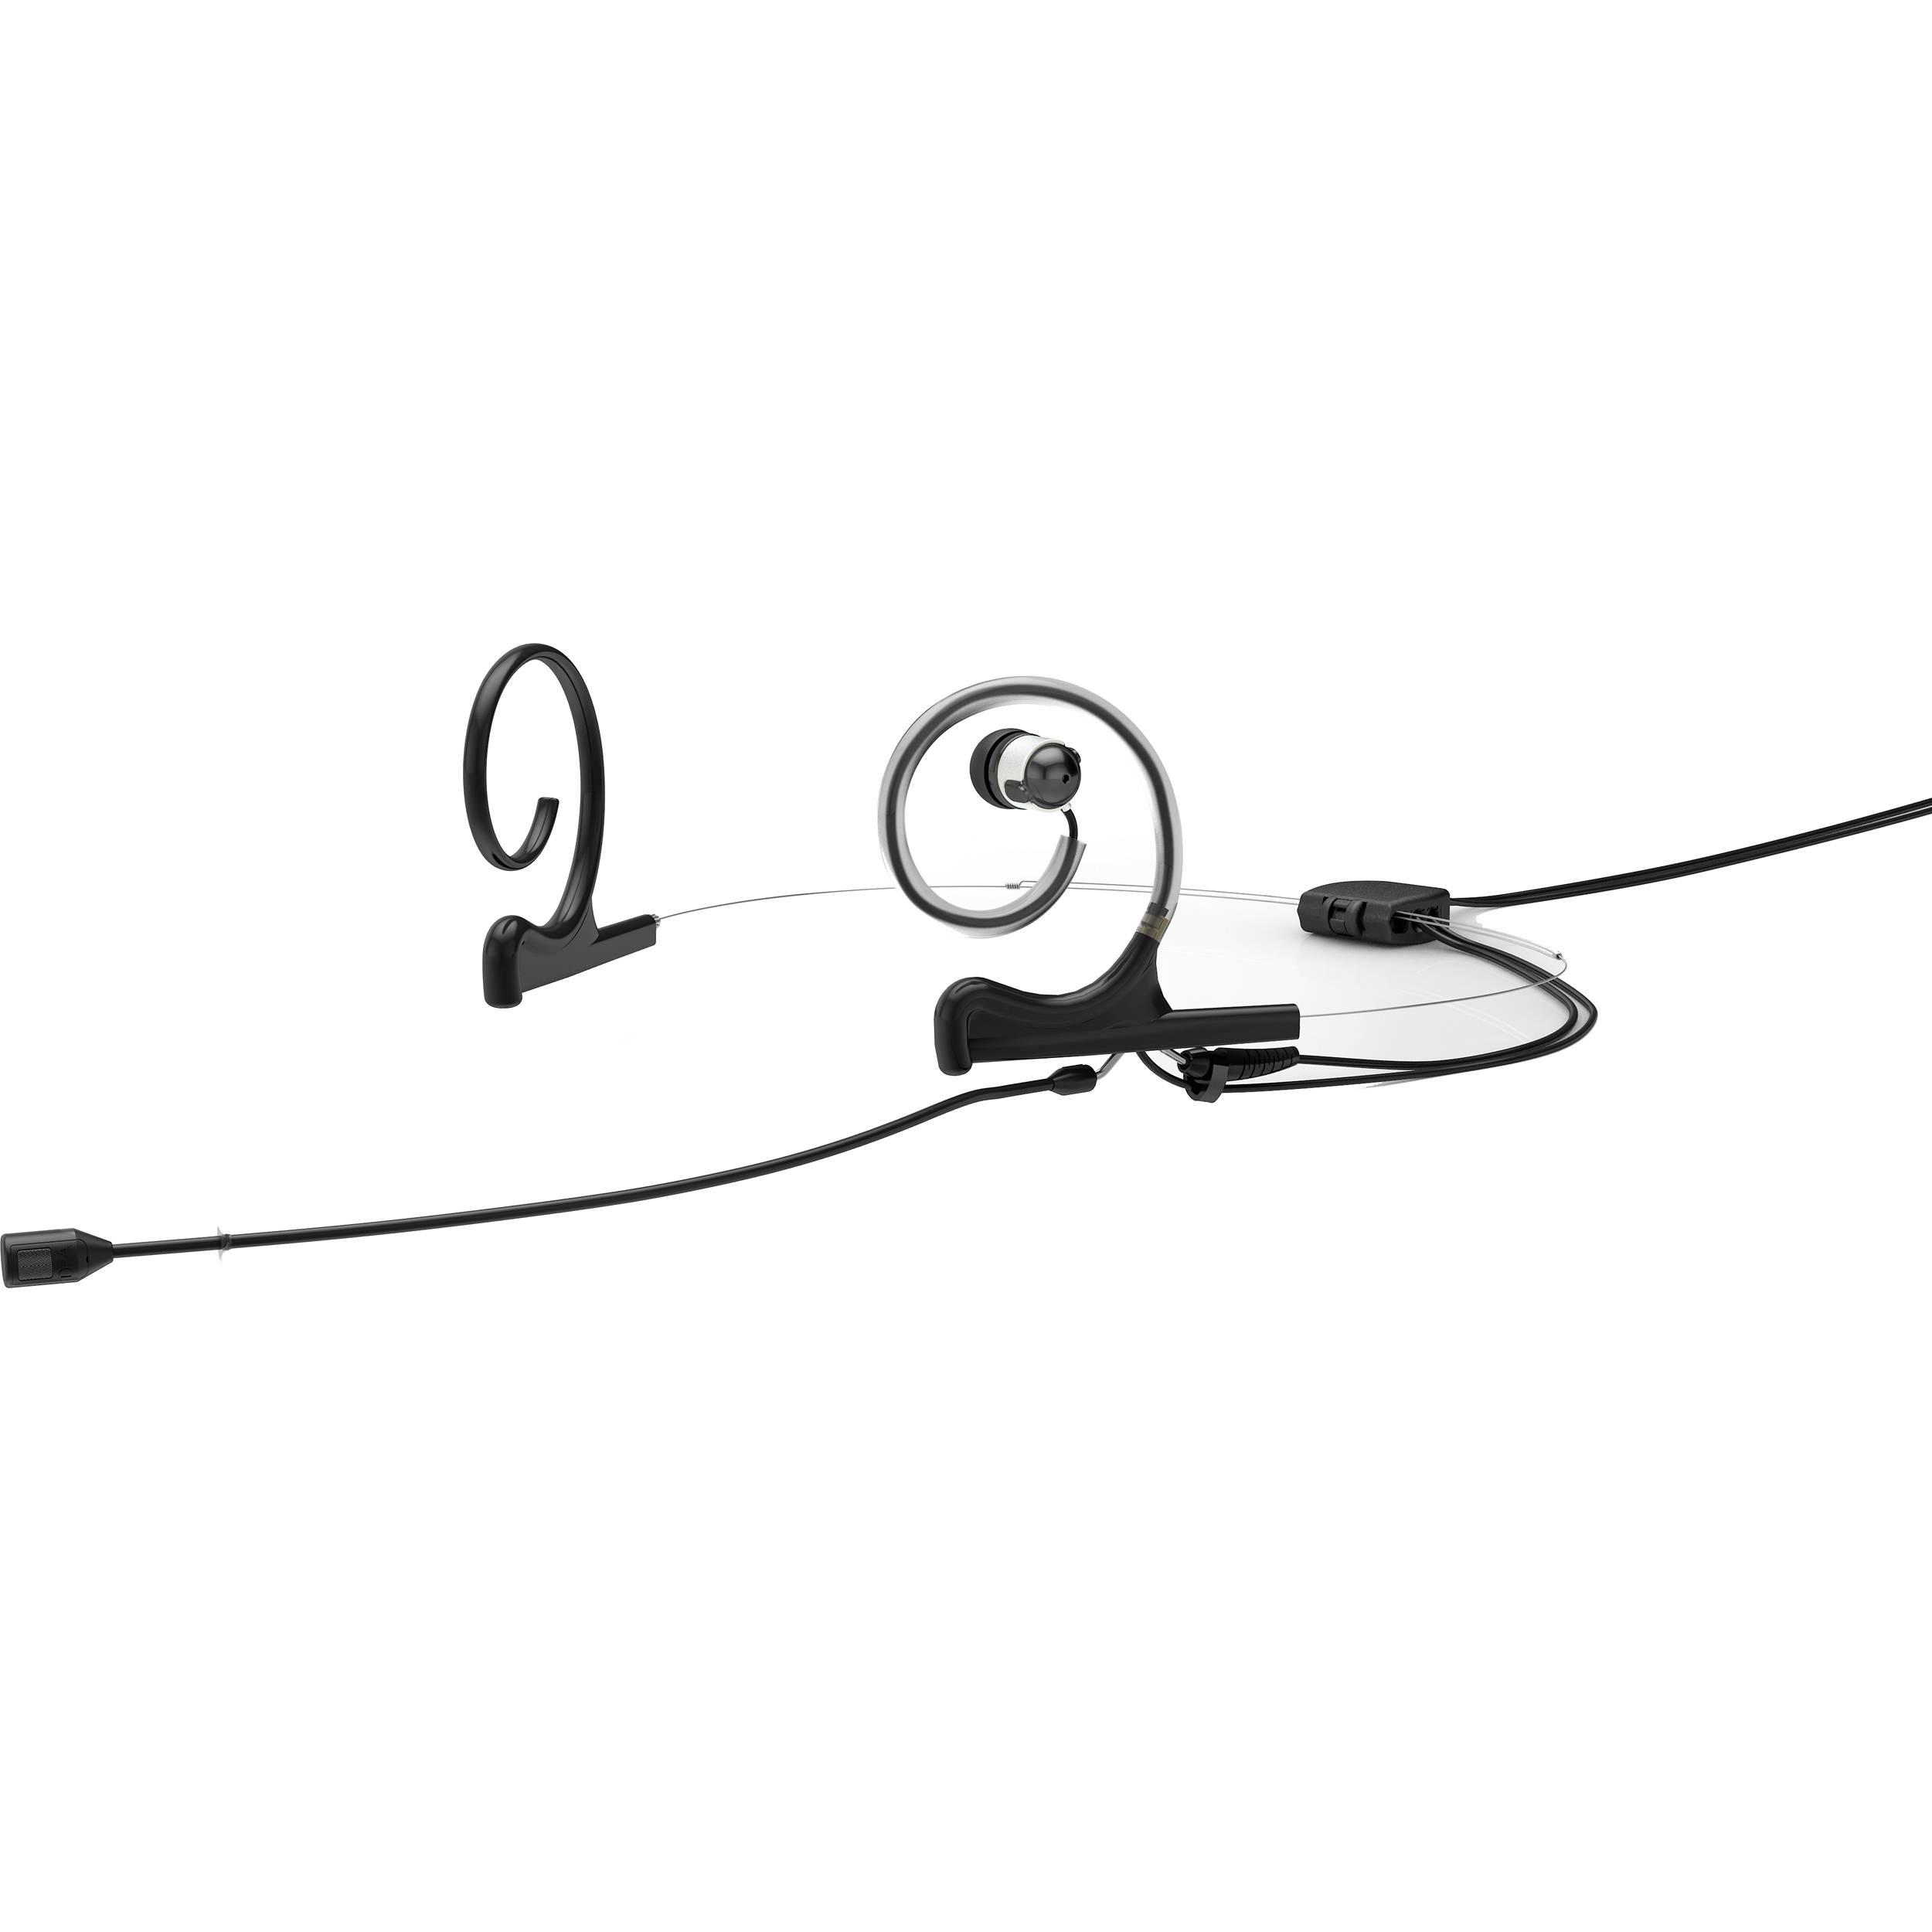 Https C Product 1123799 Reg Custom Wiring Harness Ls M S2 Dpa Microphones Fid88b56 2 Ie1 B D Fine 4088 In Ear Broadcast 1129396